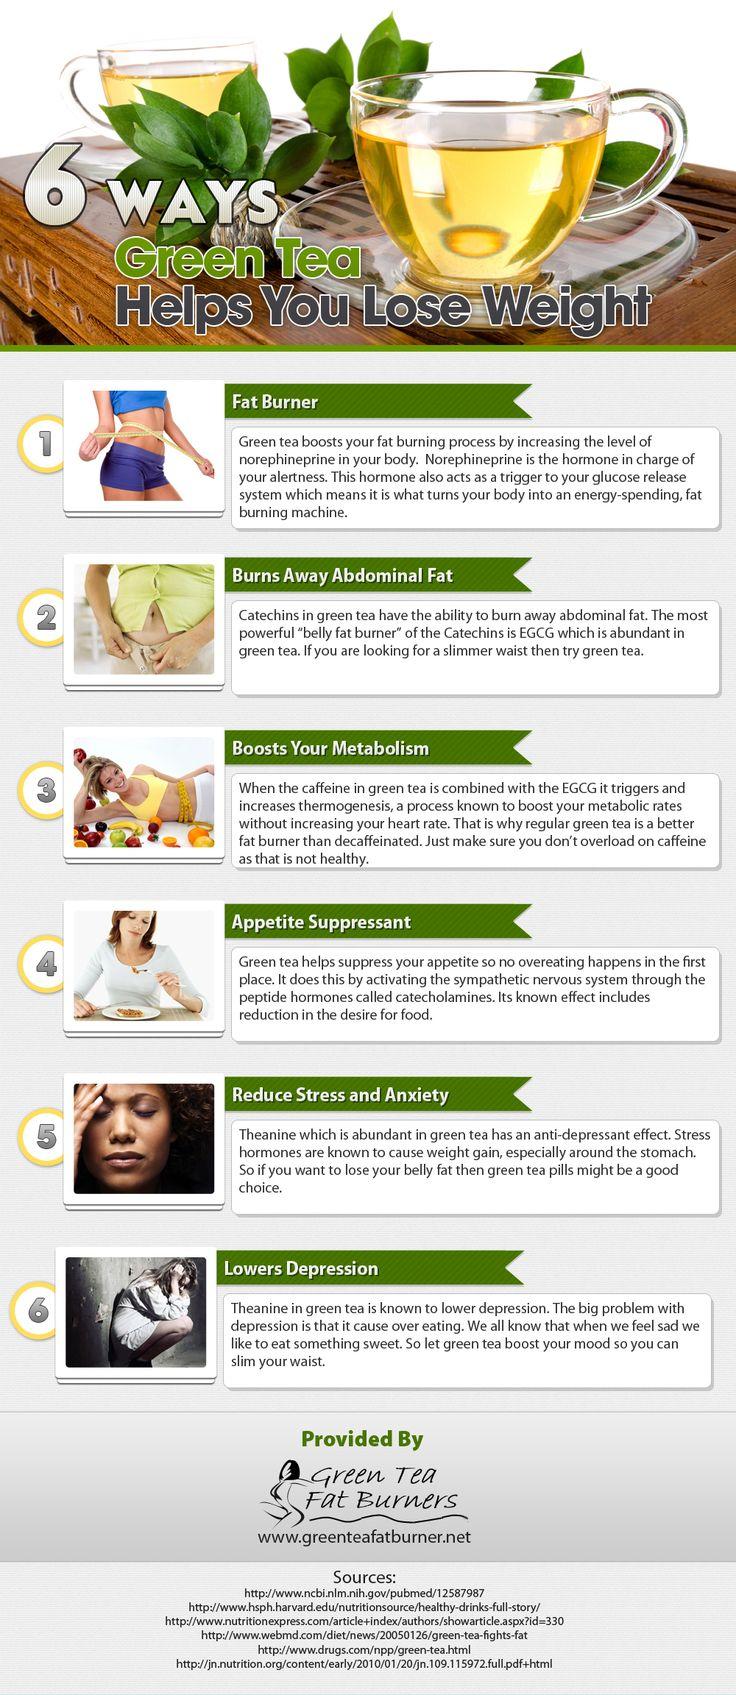 Face fat loss tips in tamil